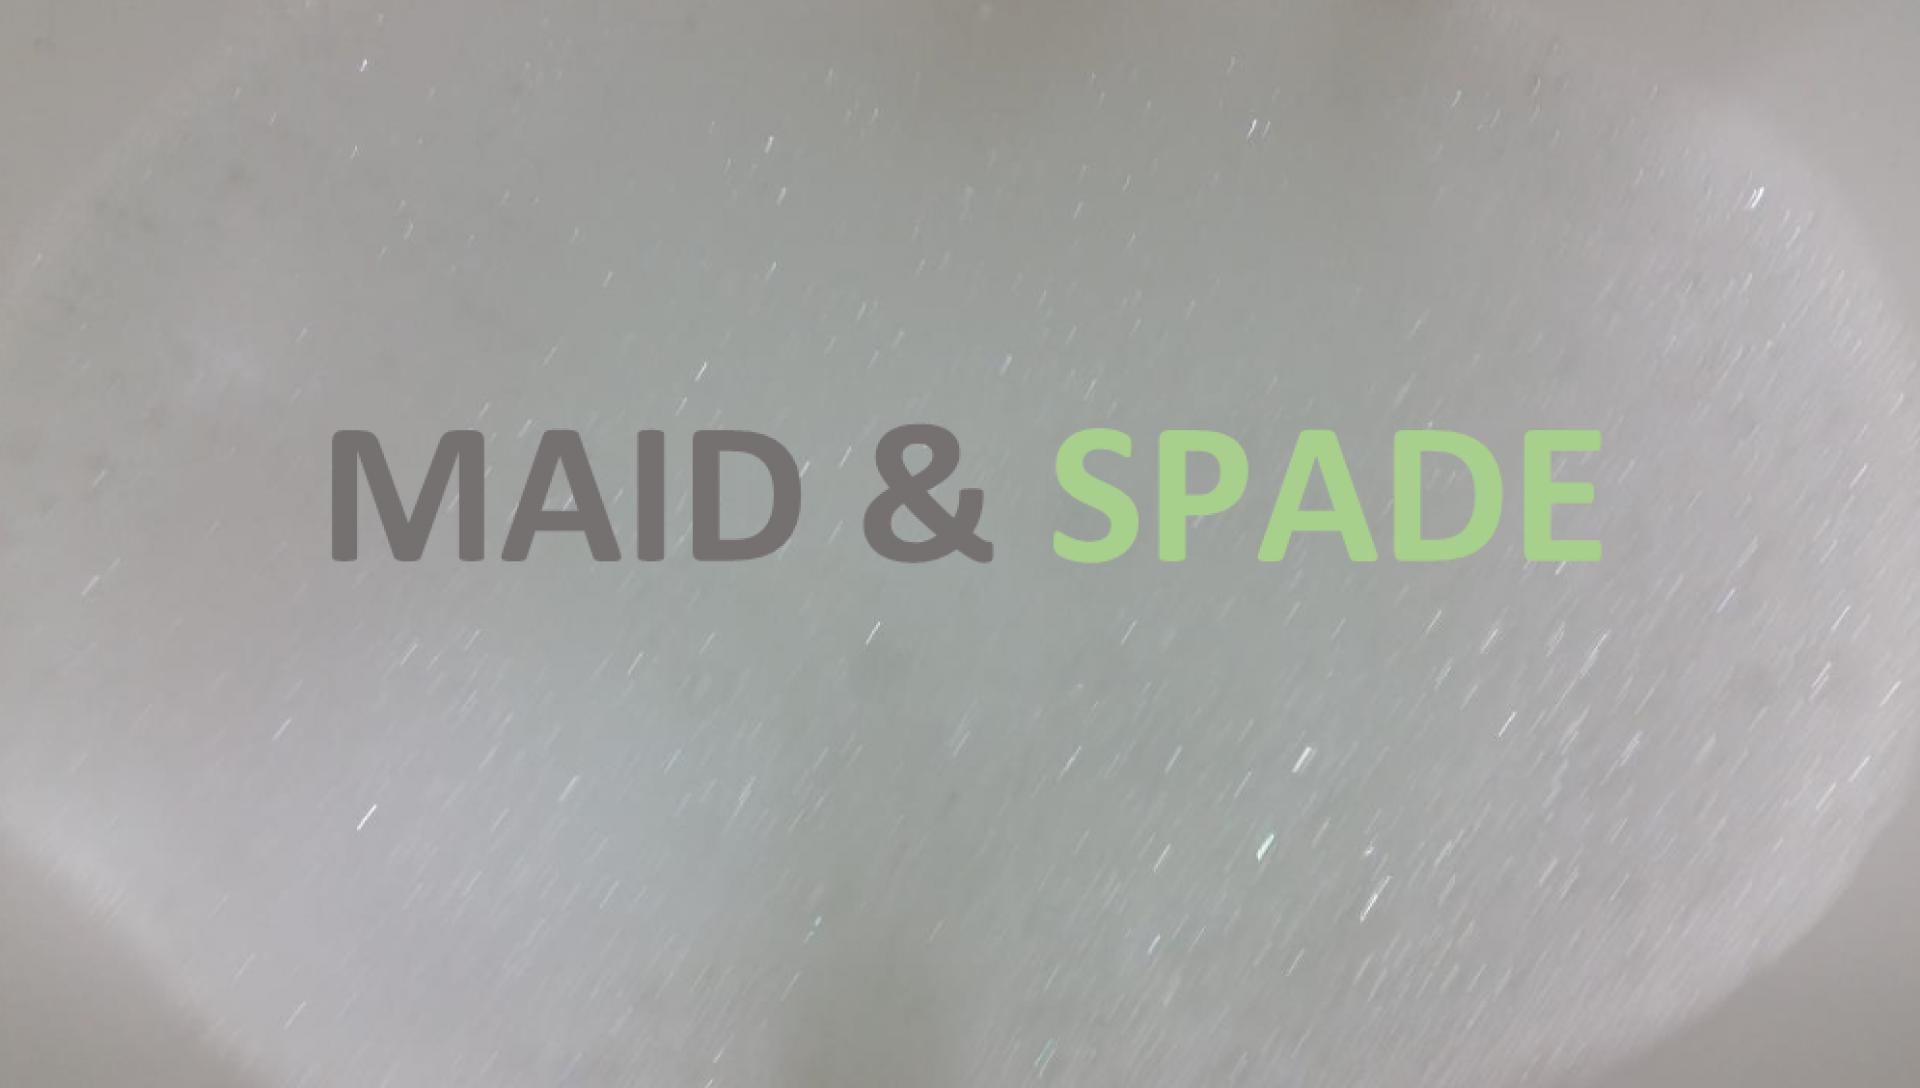 Maid & Spade Services